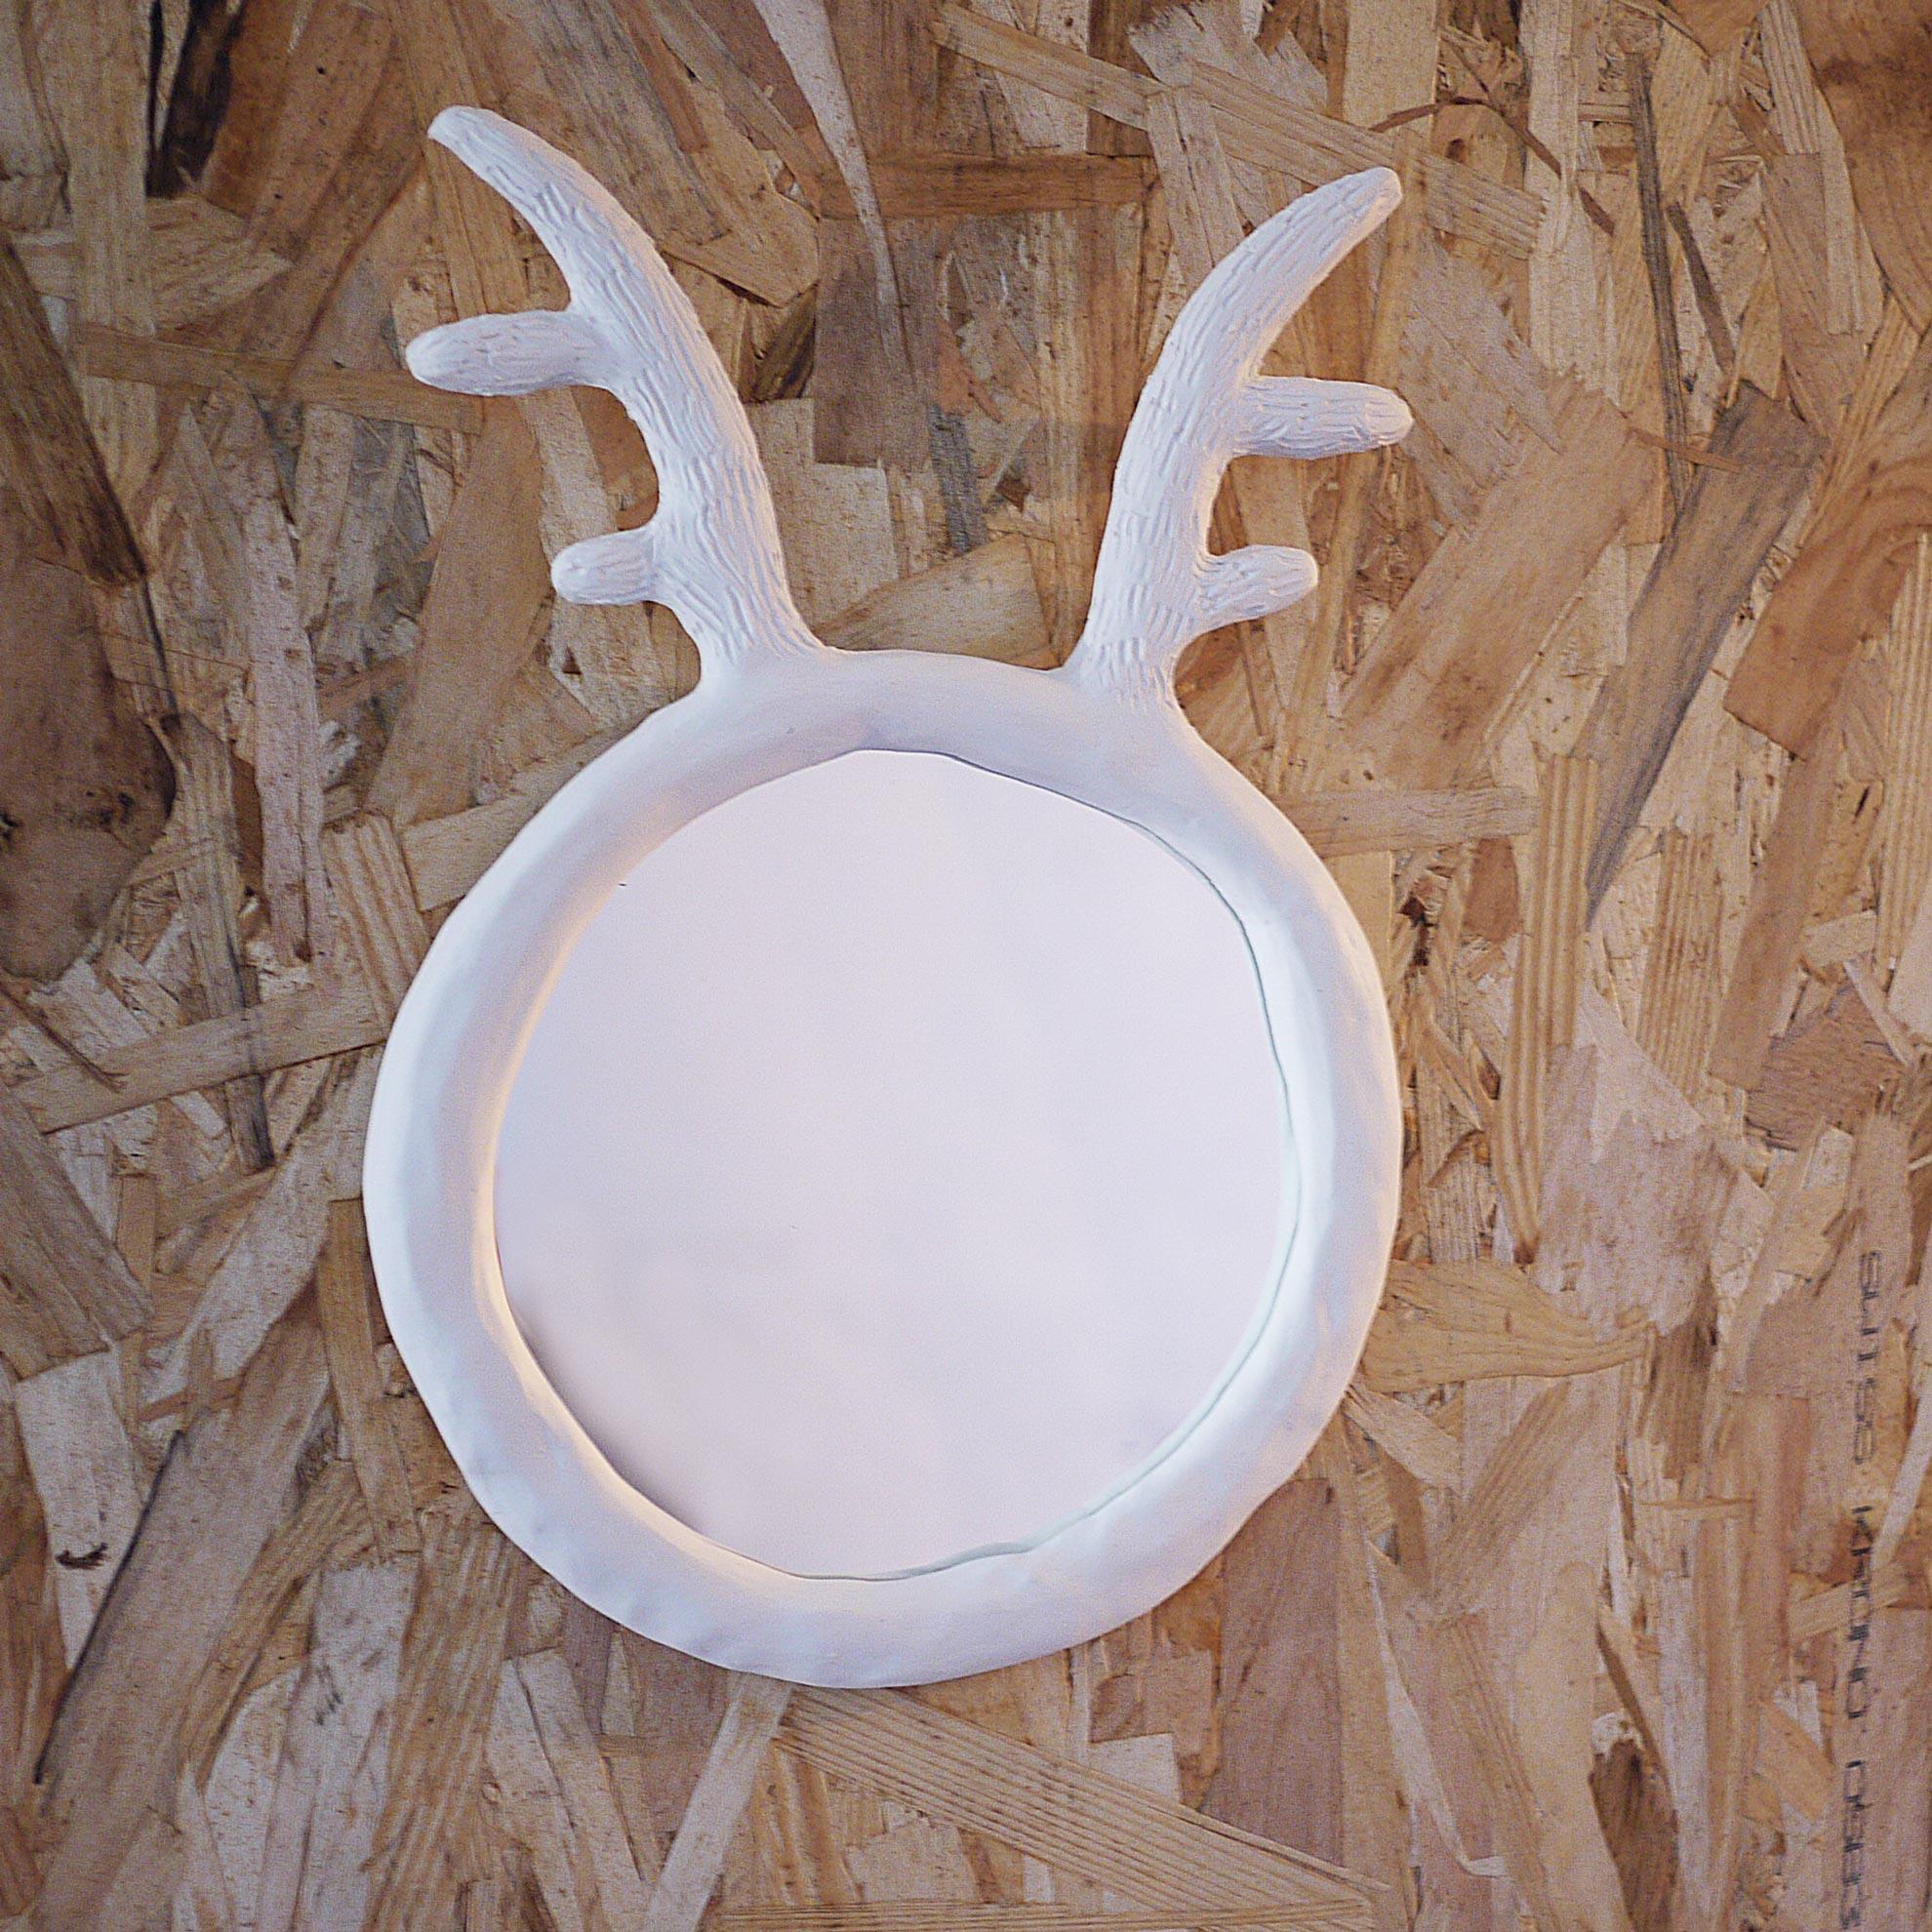 un joli miroir a tete de renne